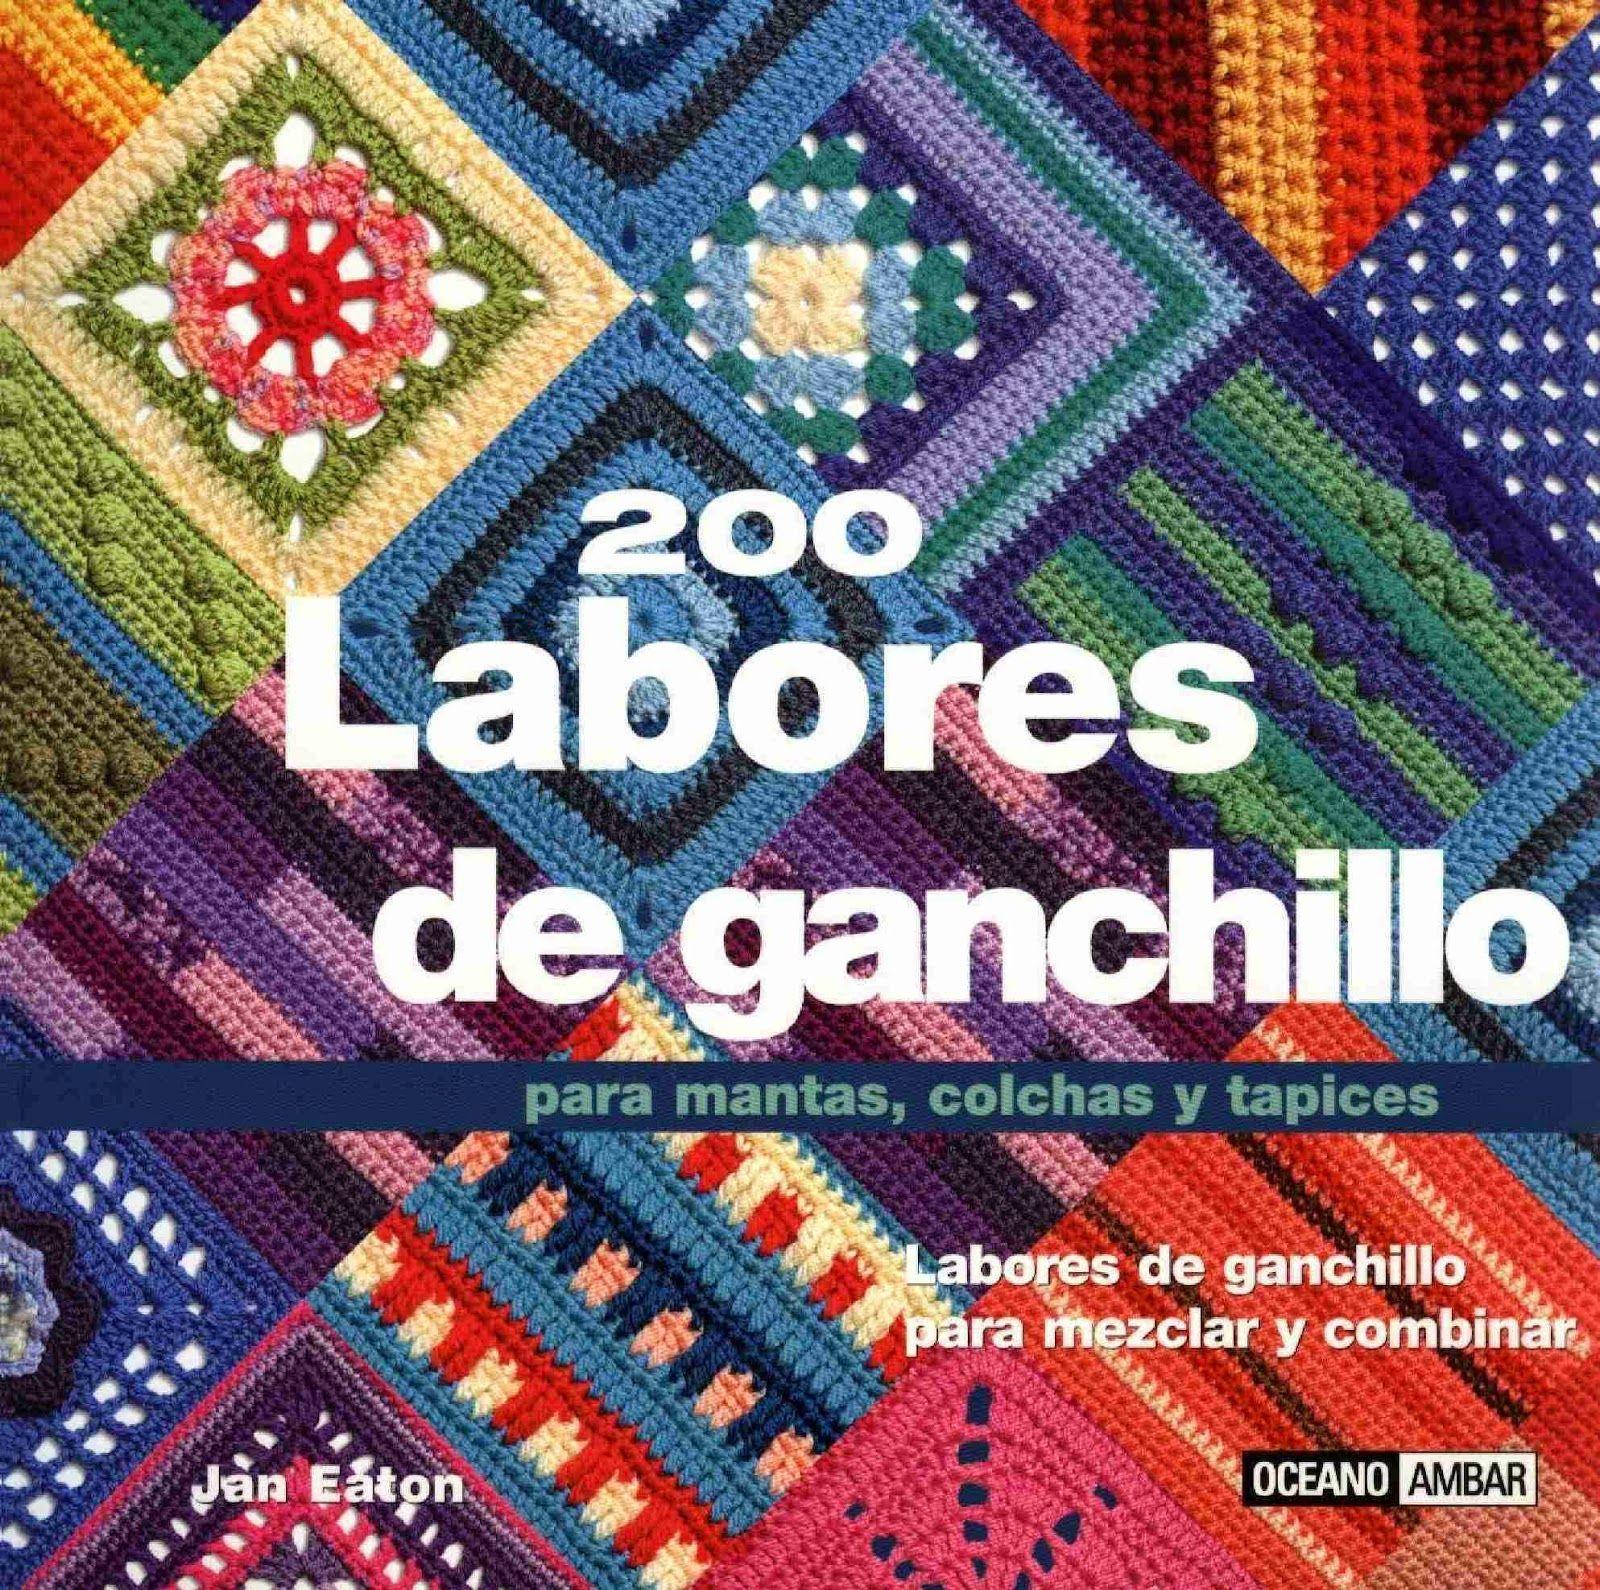 Descargar libro 200 labores de ganchillo gratis tejidos - Aplicaciones de ganchillo para colchas ...